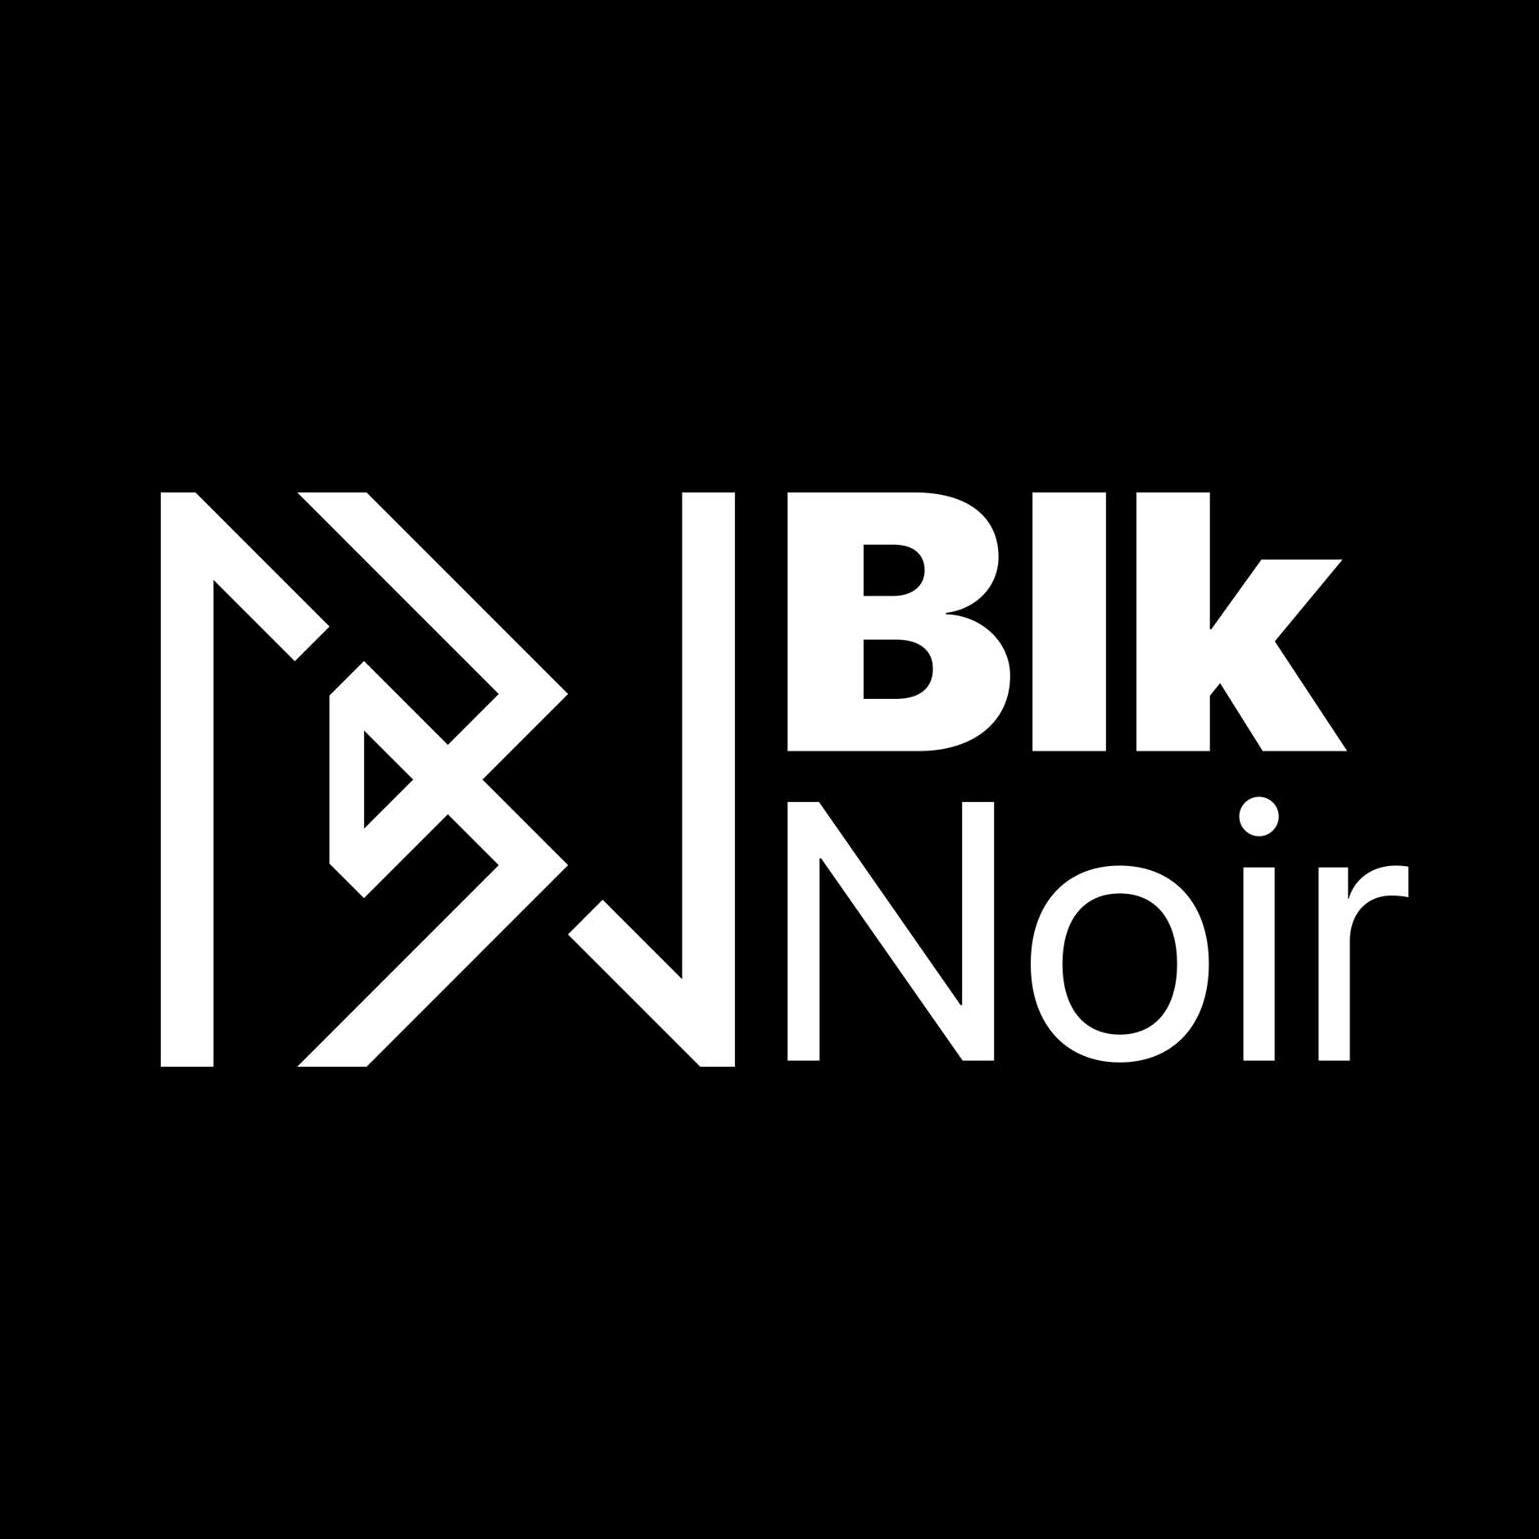 BlkNoir